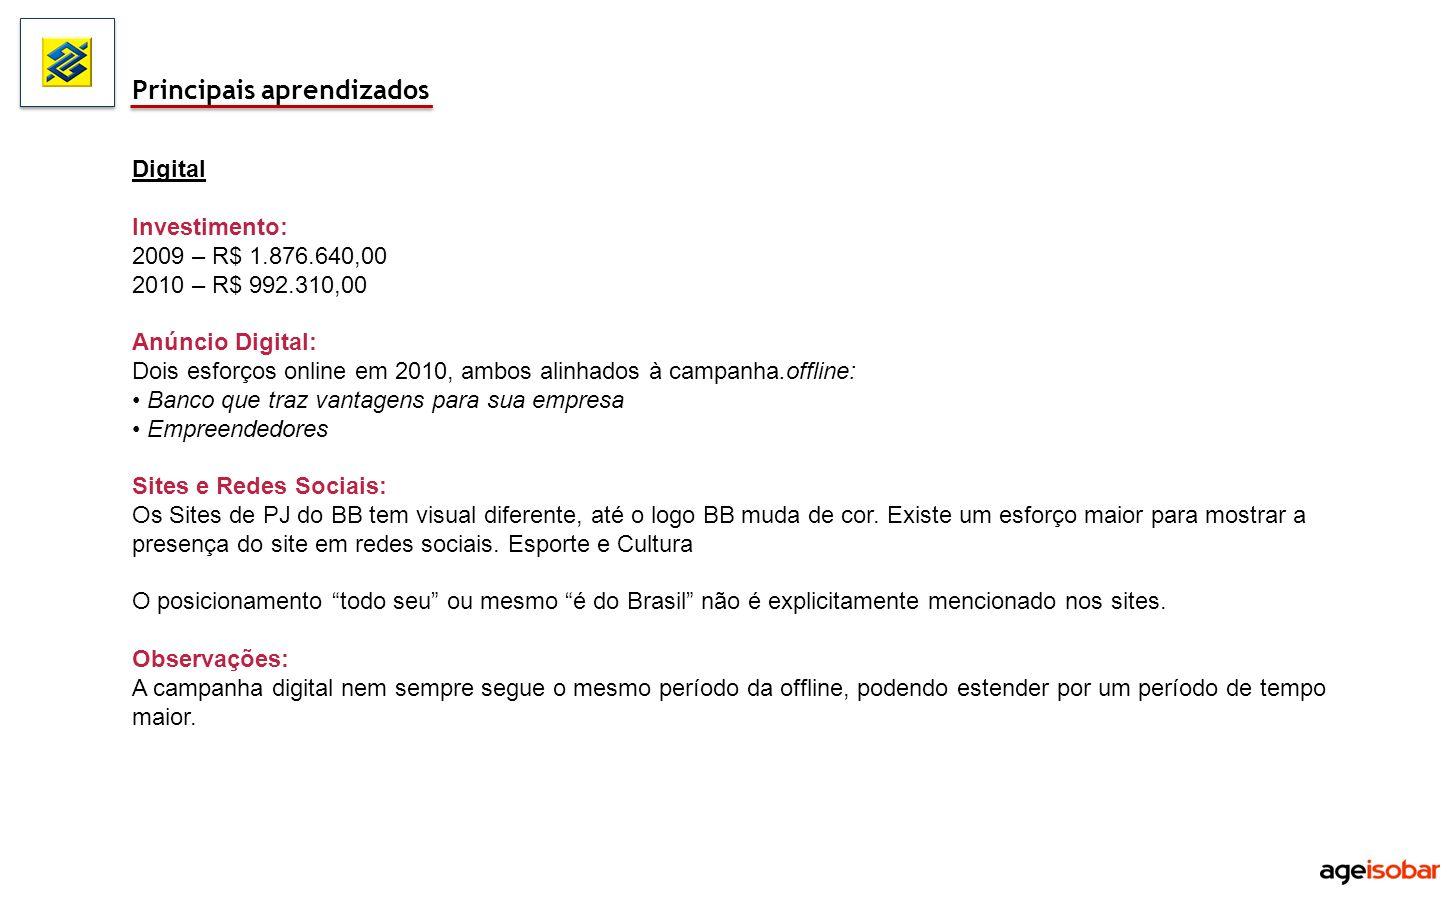 http://www.consultoriaextremeonline.com.br